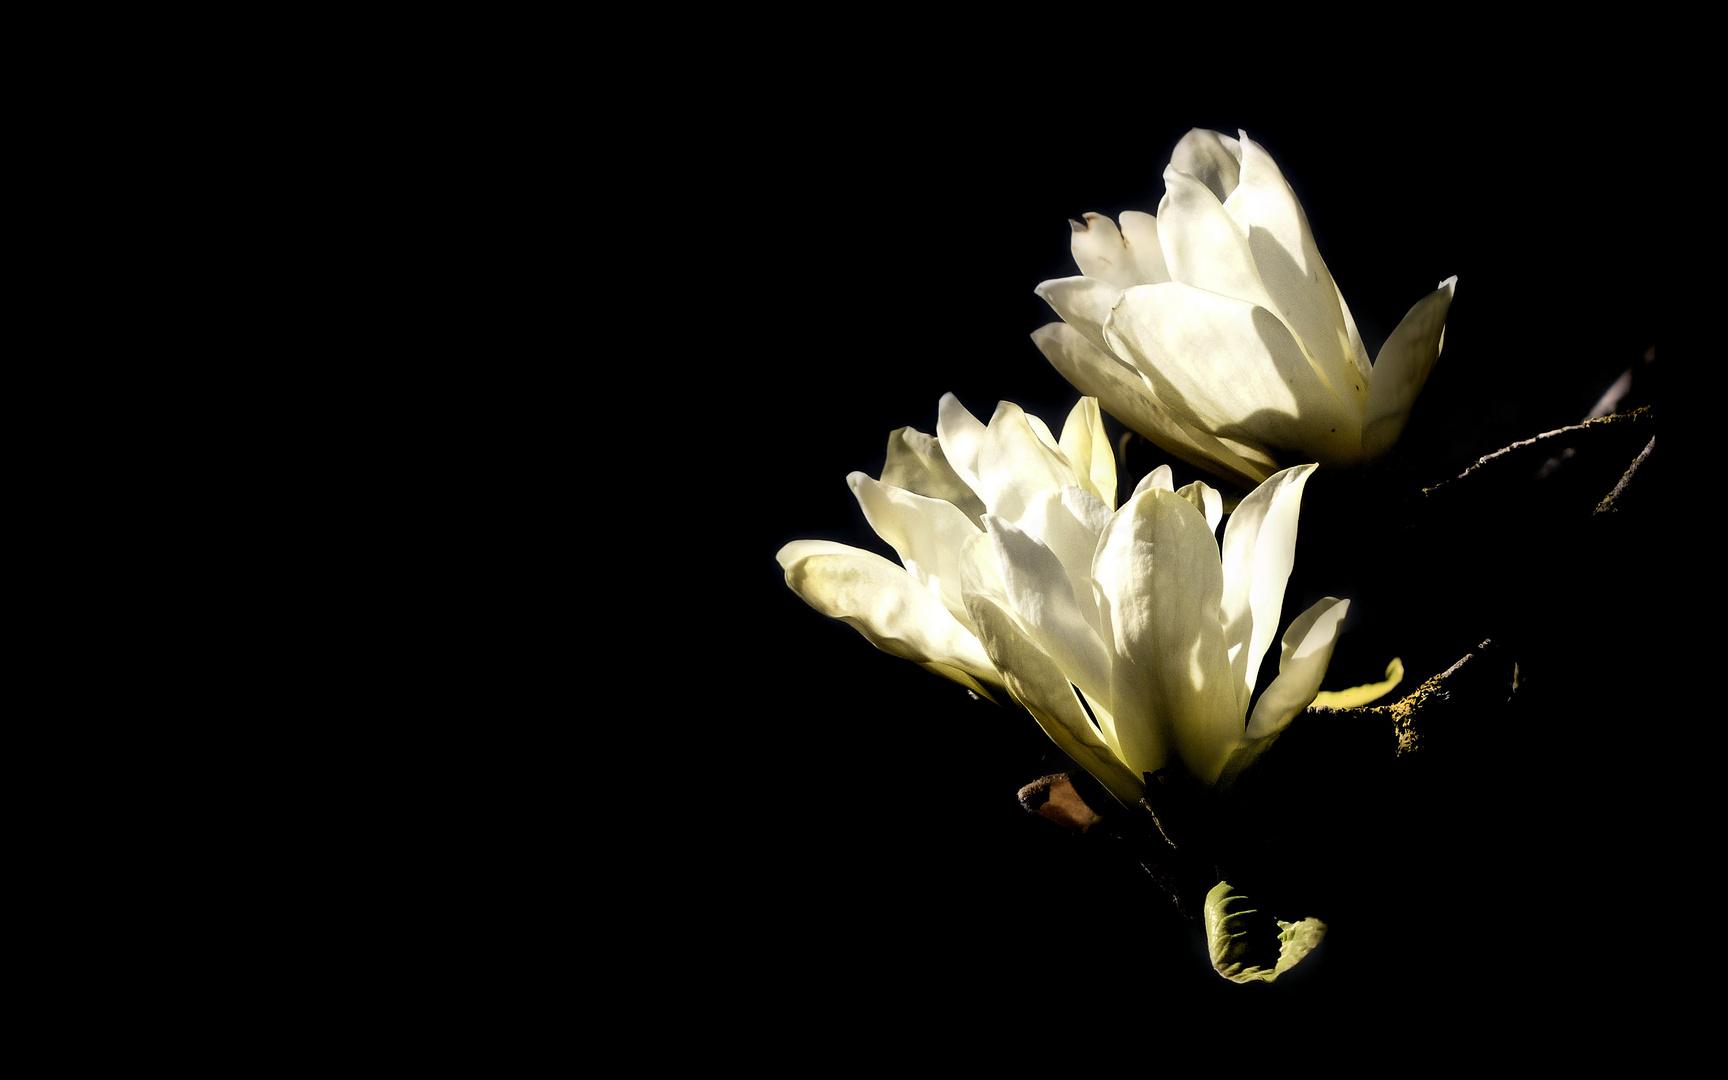 ... magnolia flowers